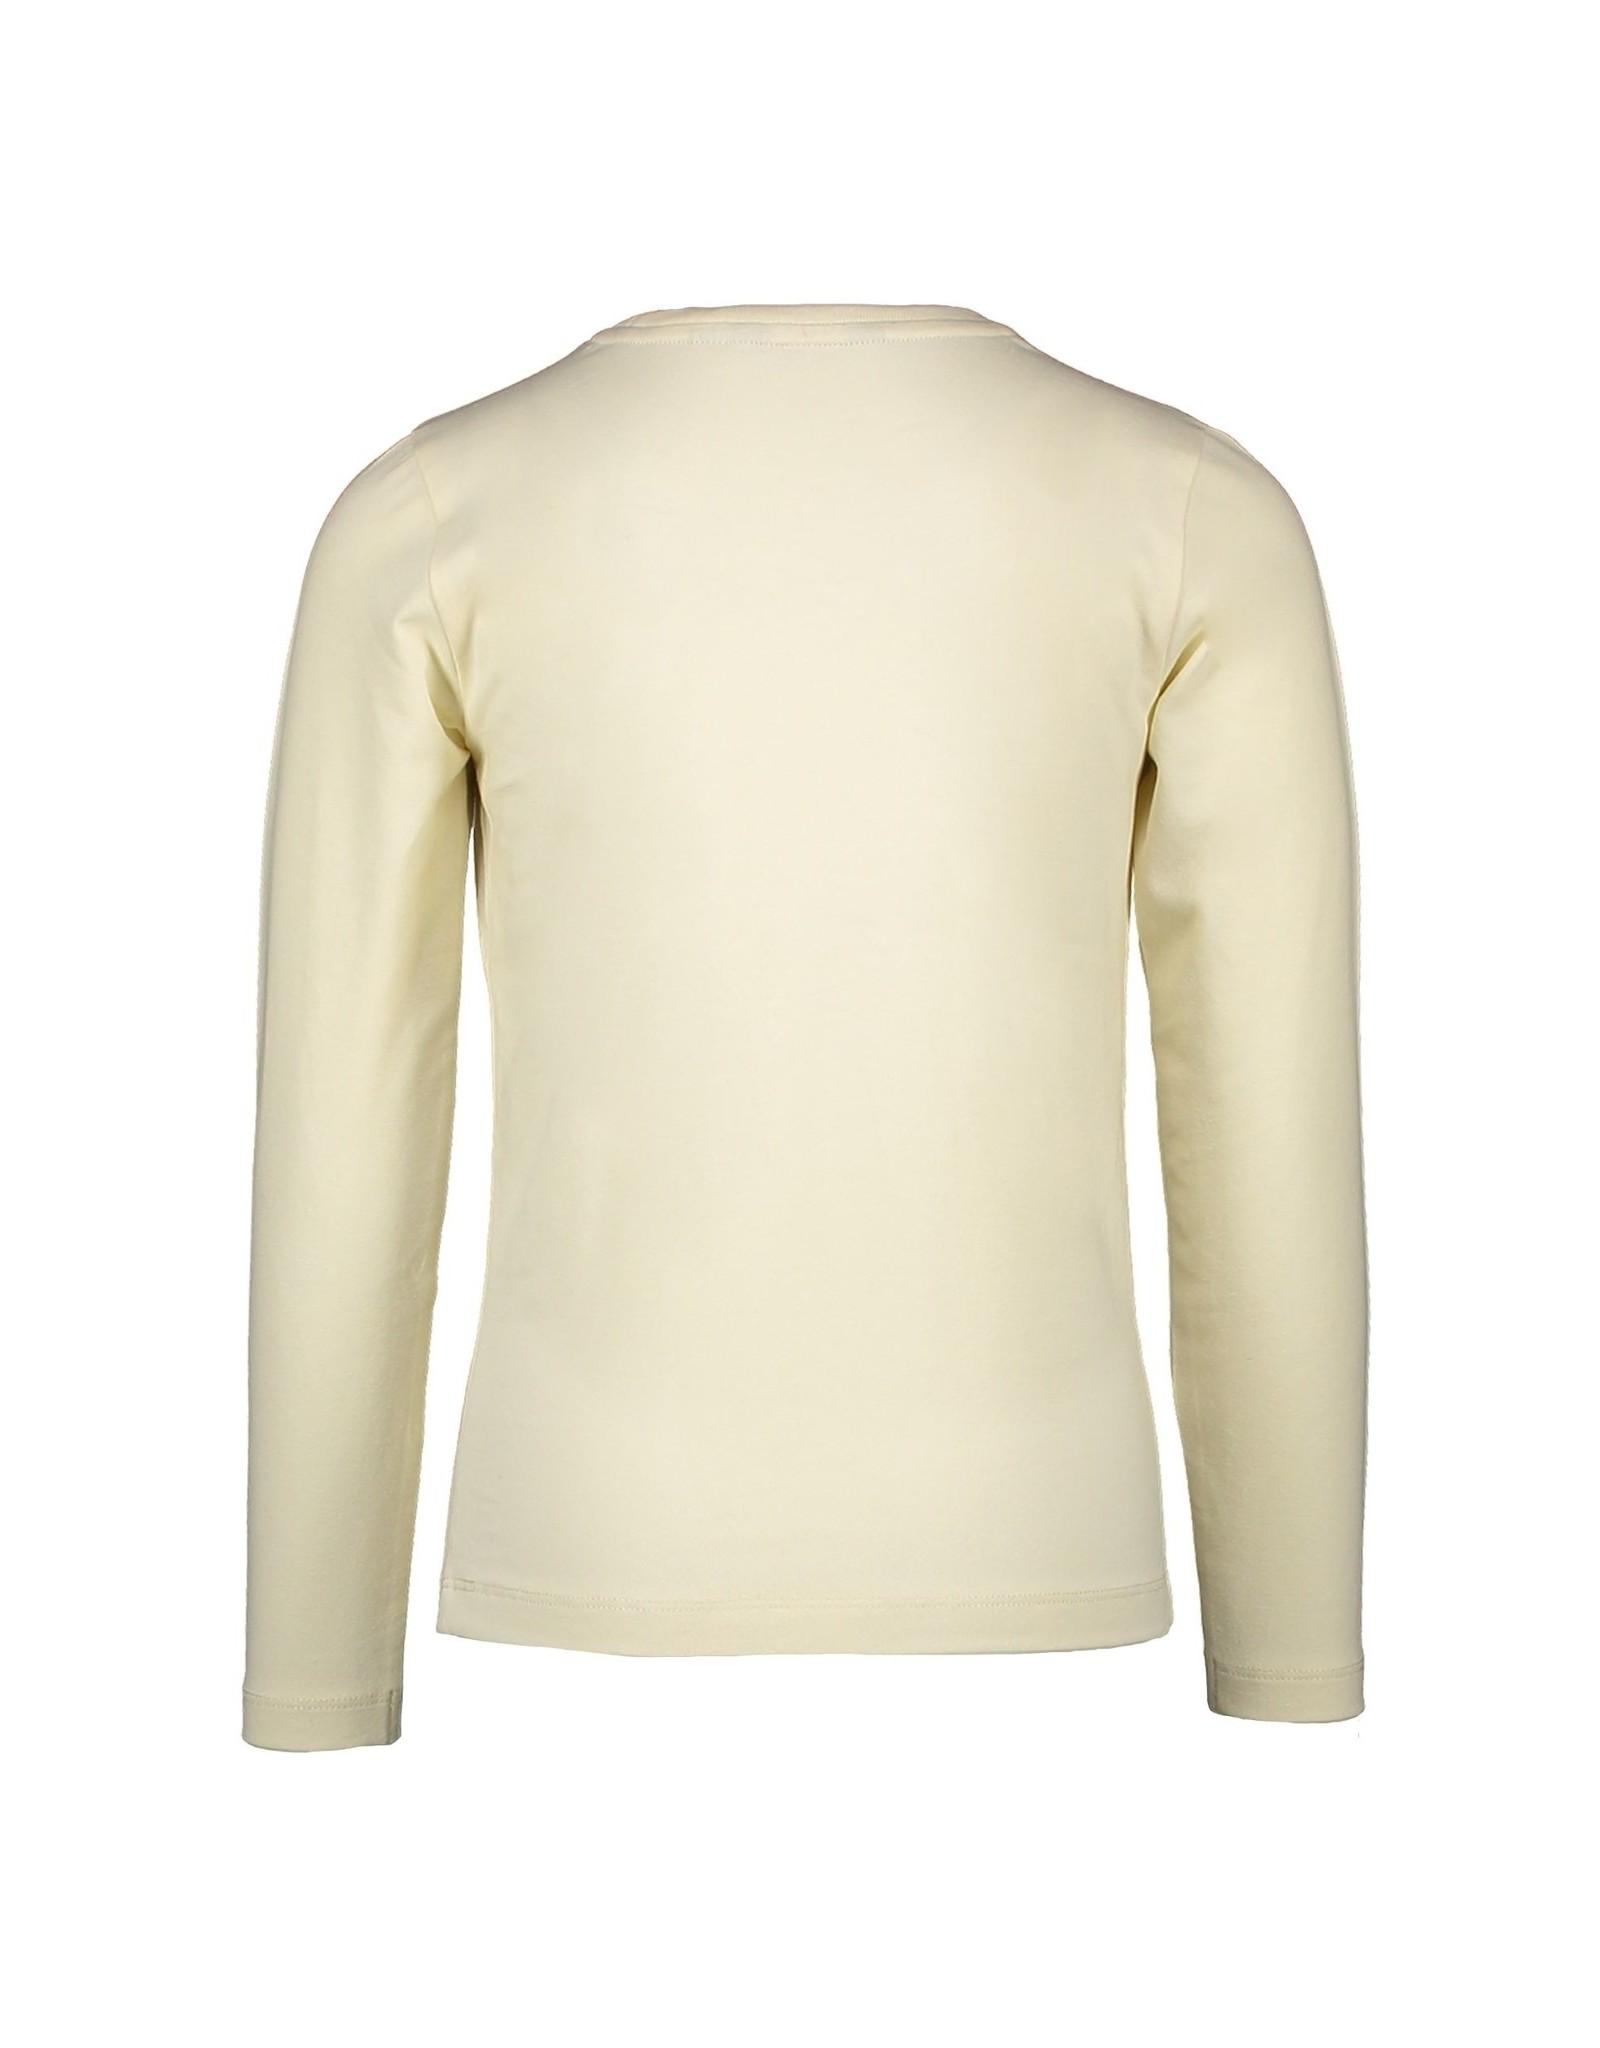 Moodstreet Moodstreet shirt 5402 warm white